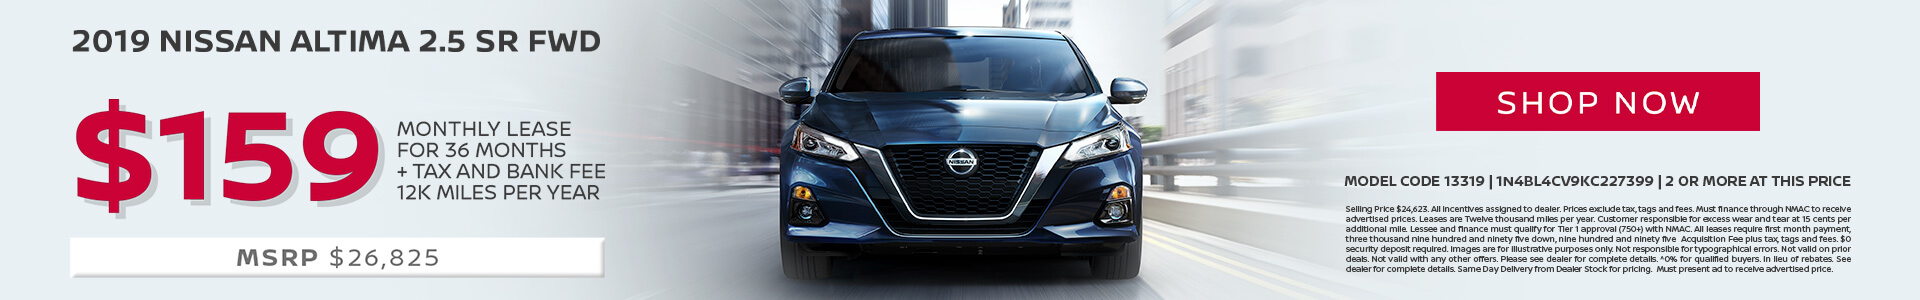 Nissan Altima $159 Lease